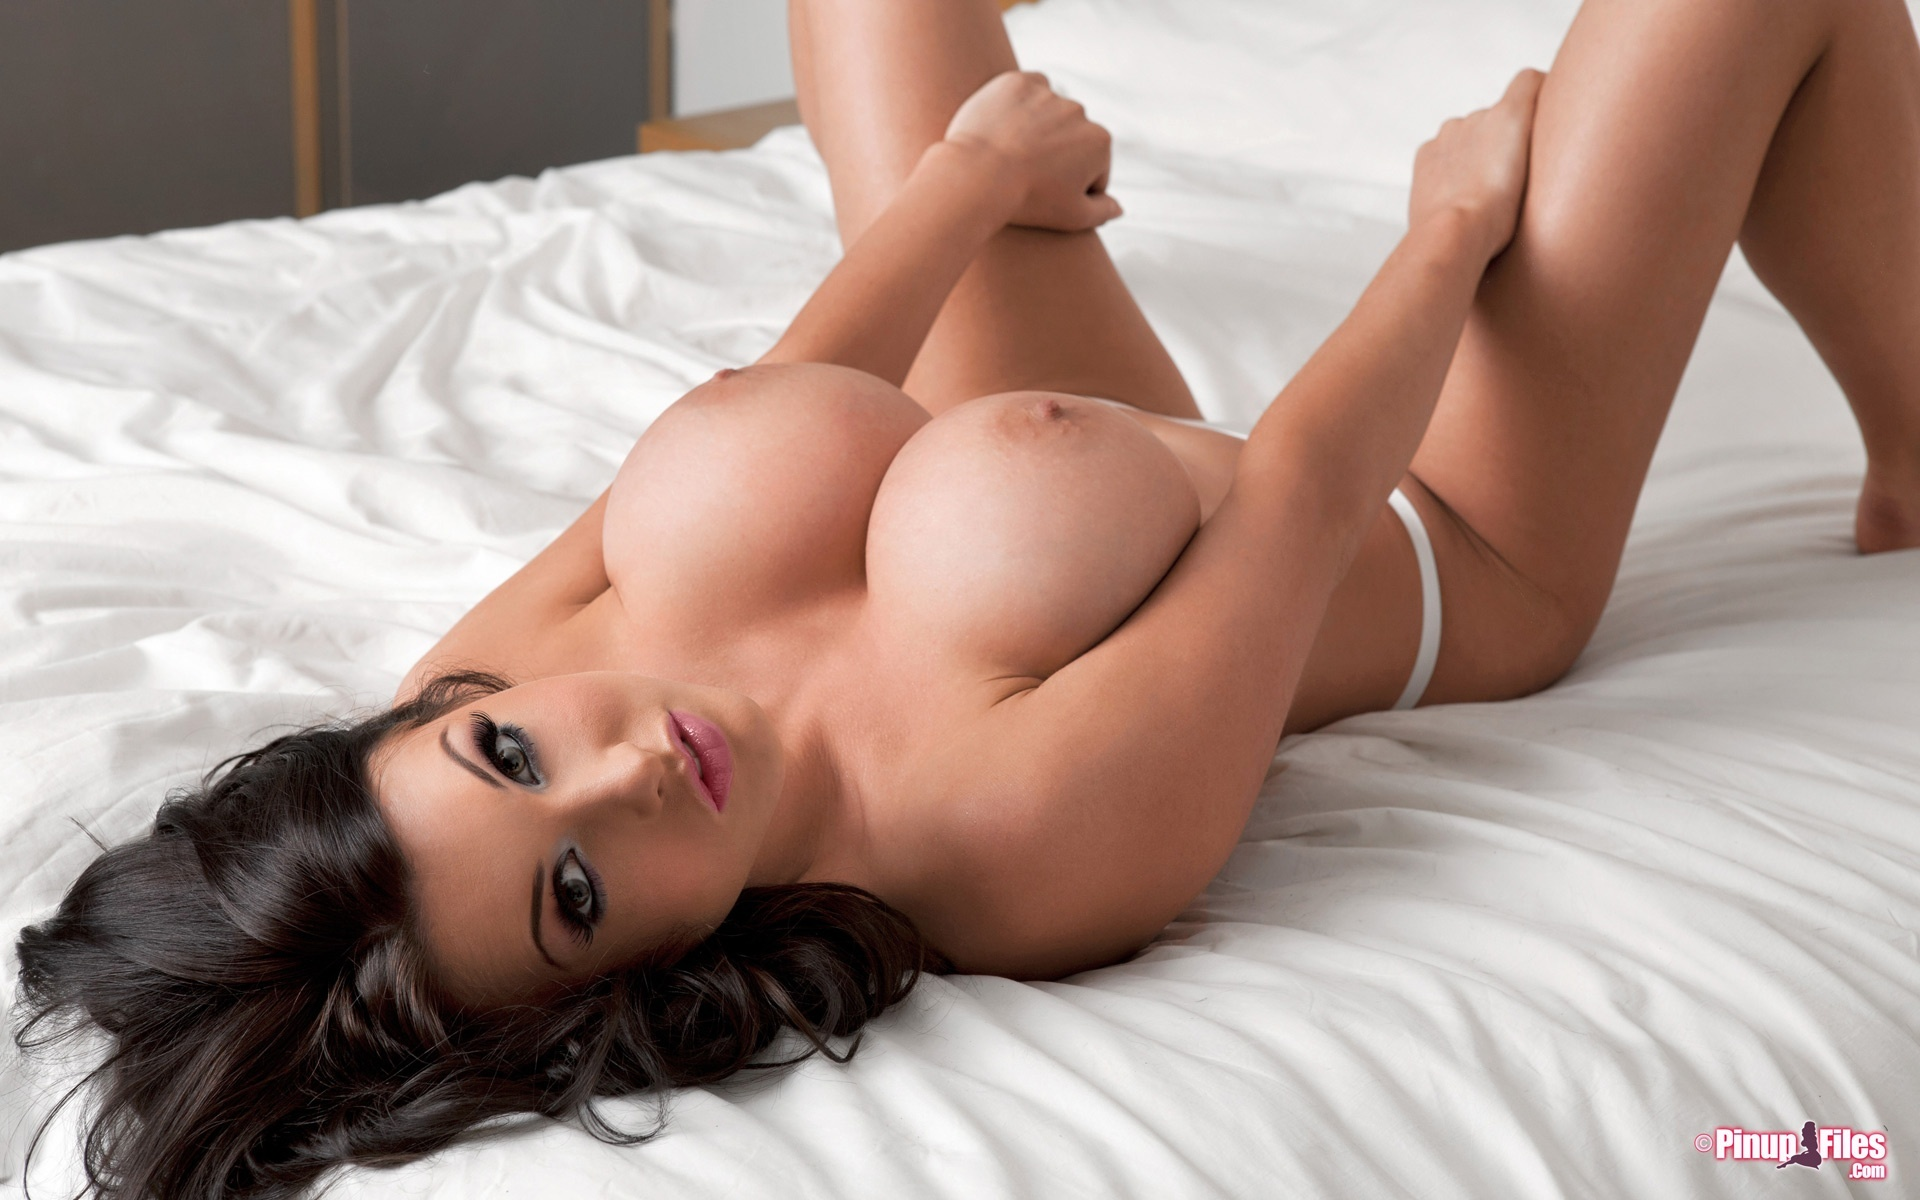 Girl sex nude wallpaper sexy films